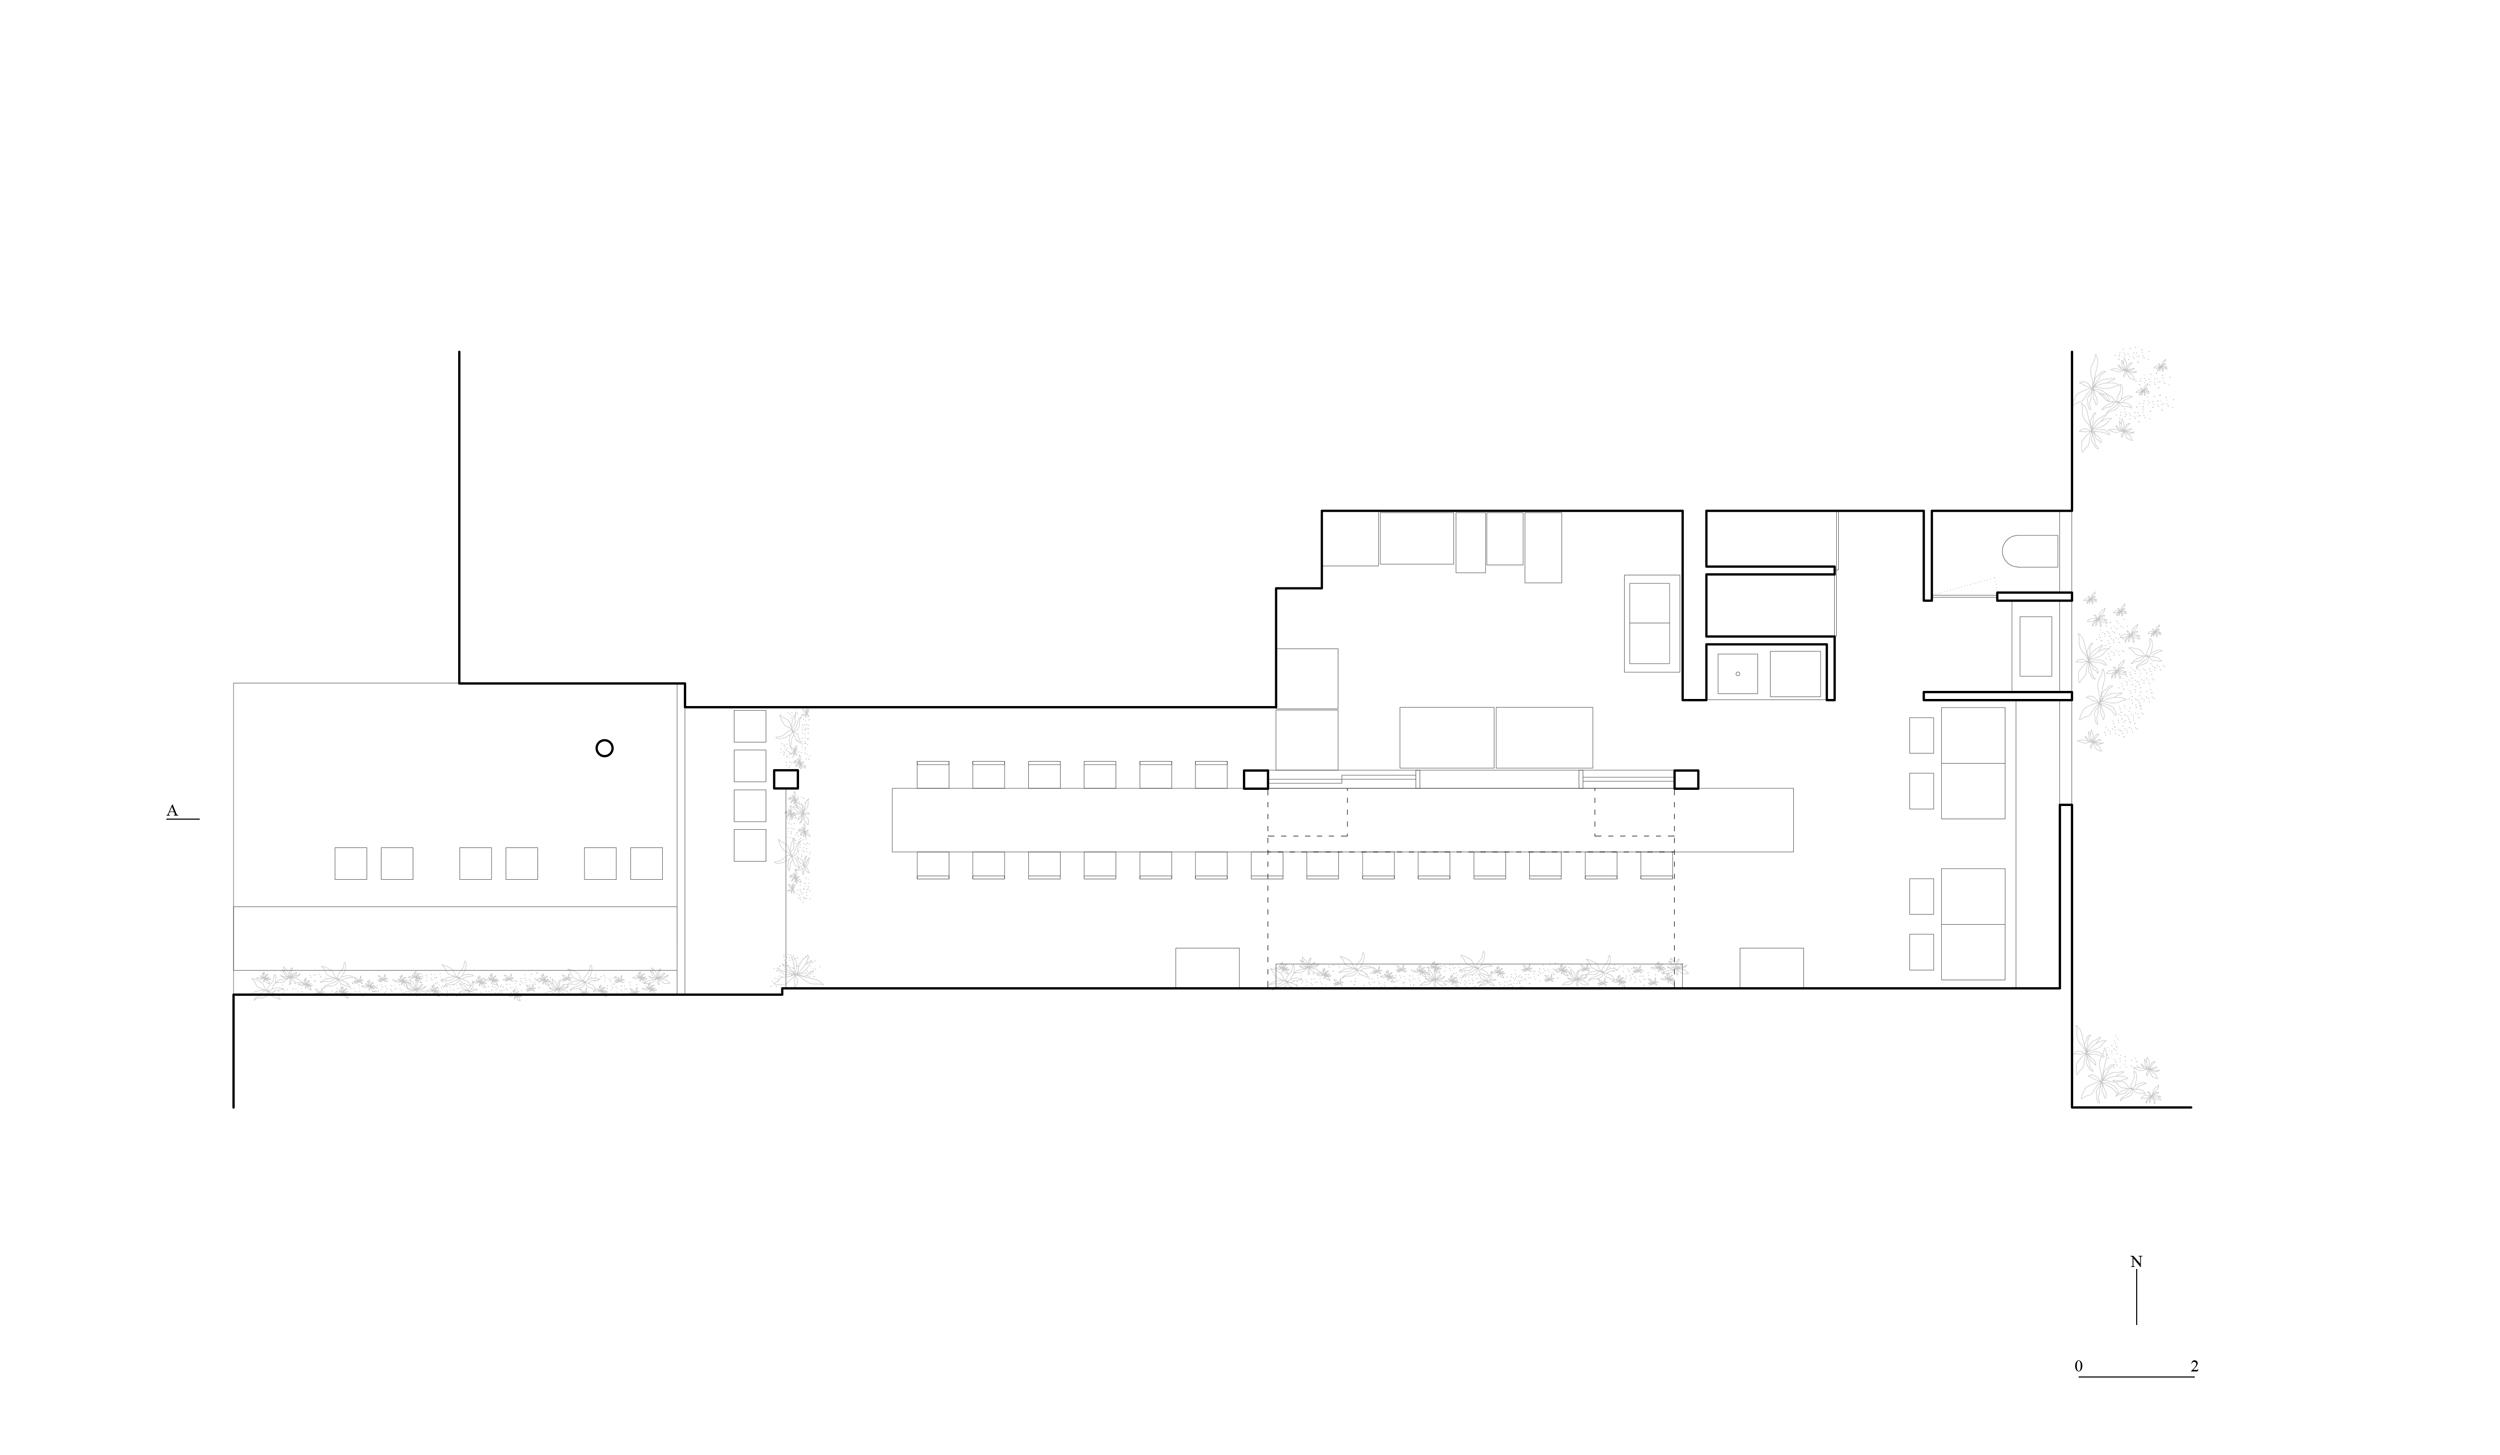 hato-restaurant-plan-01.jpg